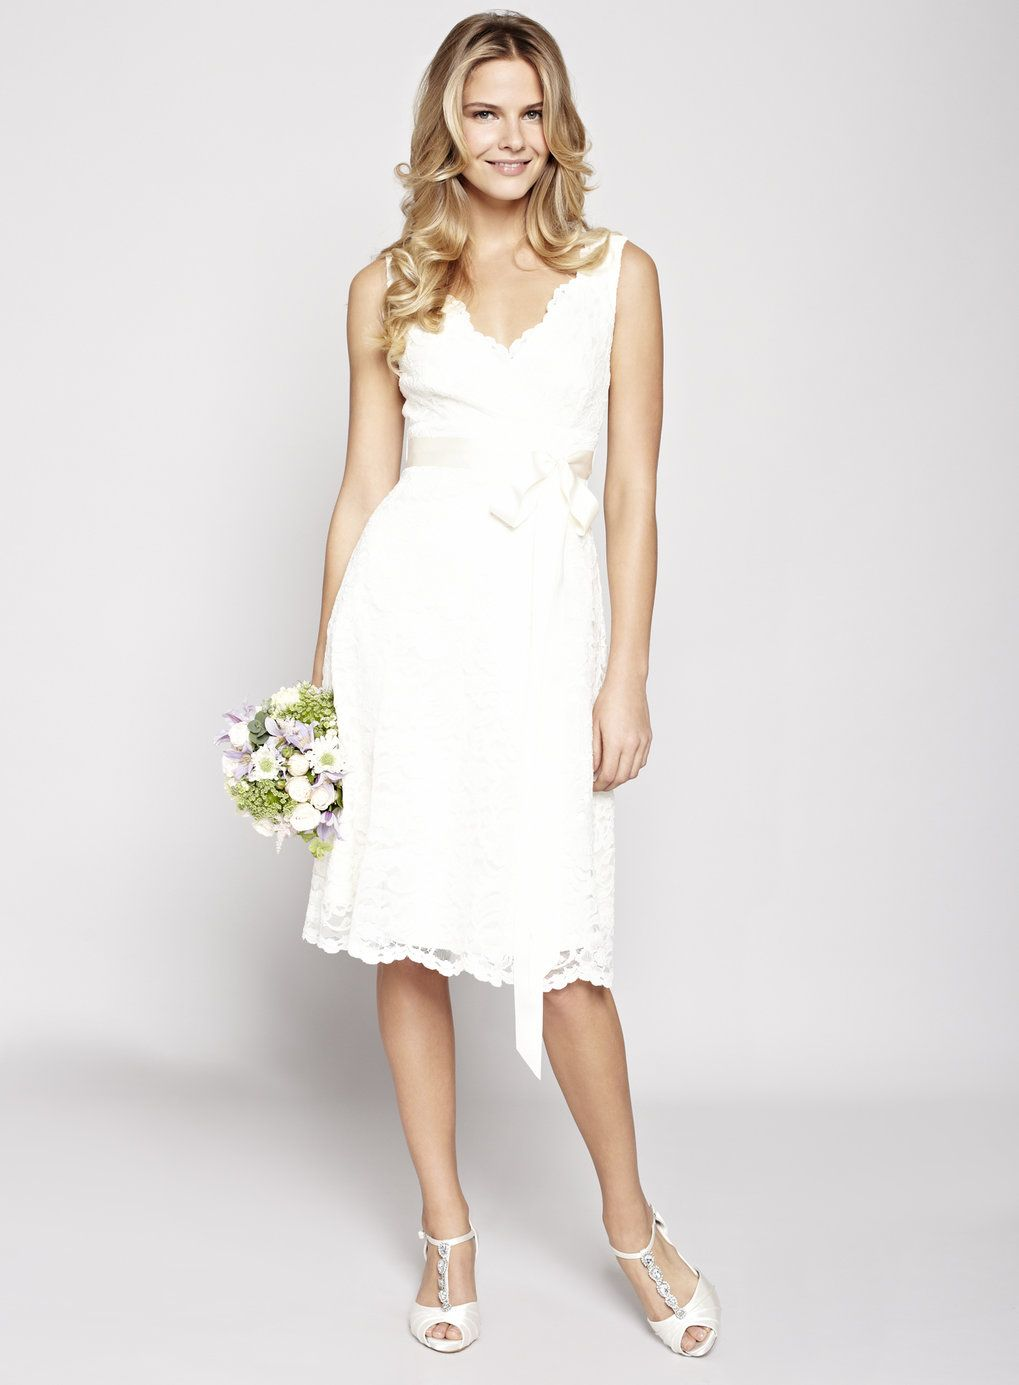 ivory wedding dress NEW Modern A line Princess Straps Knee Length Wedding Dress with Sash Applique